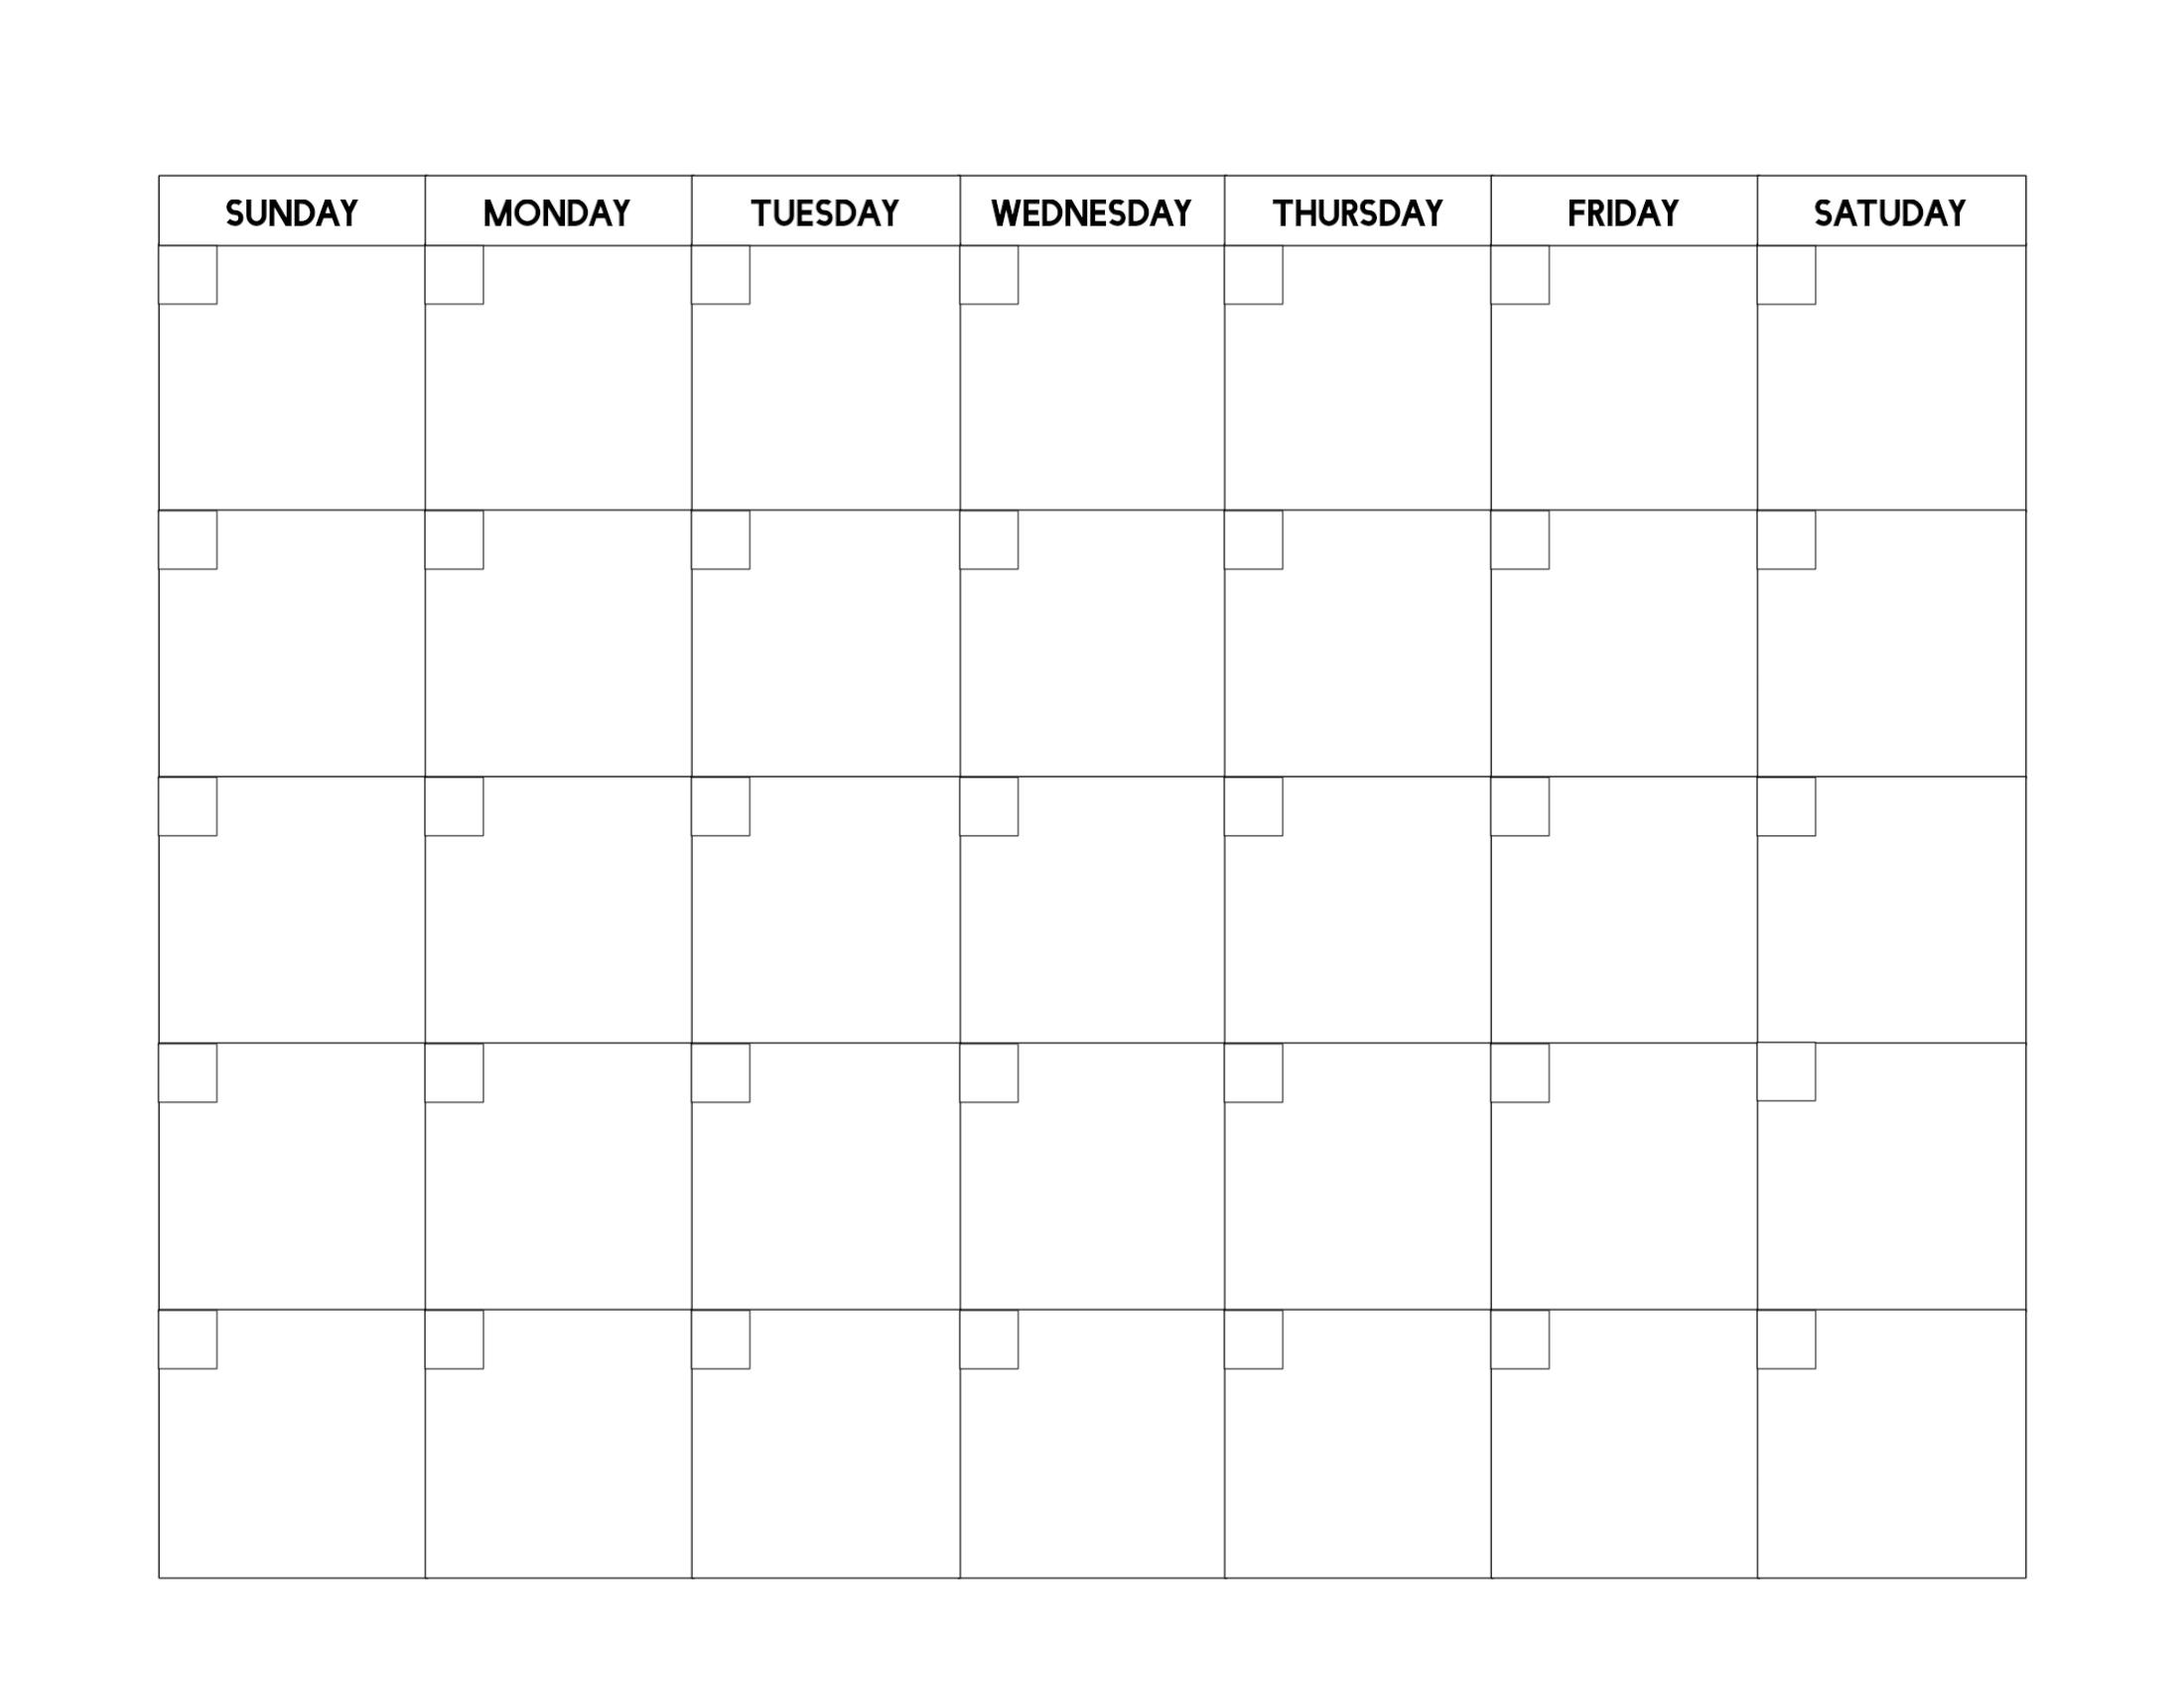 Free Printable Blank Calendar Template | Paper Trail Design for Empty Calendar Printable